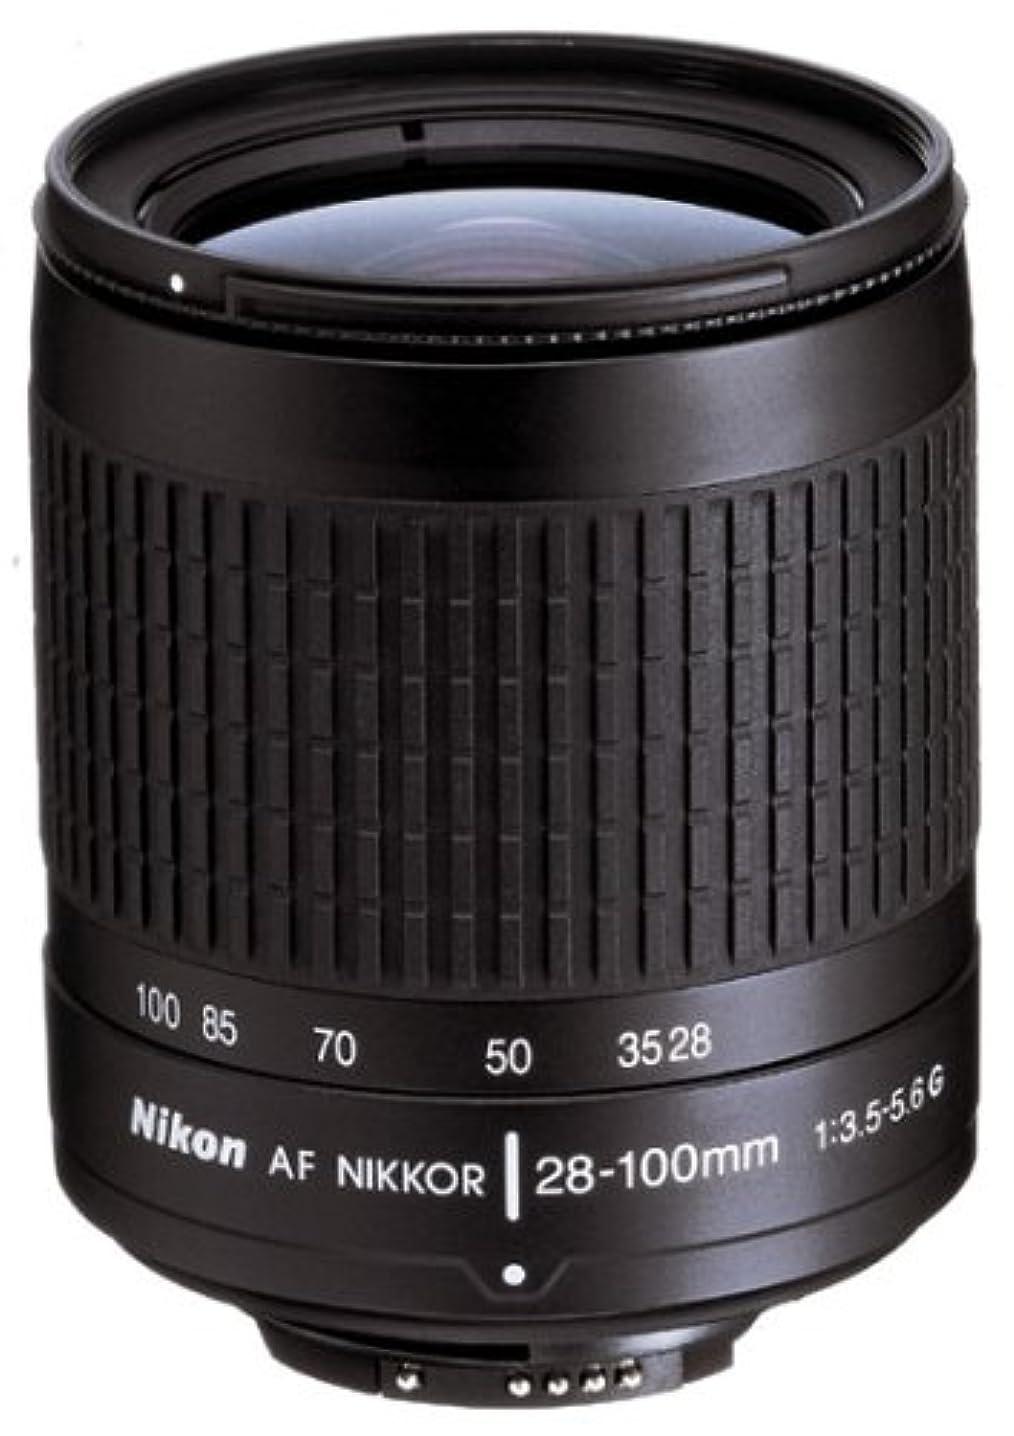 Nikon 28-100mm f/3.5-5.6G Autofocus Nikkor Lens